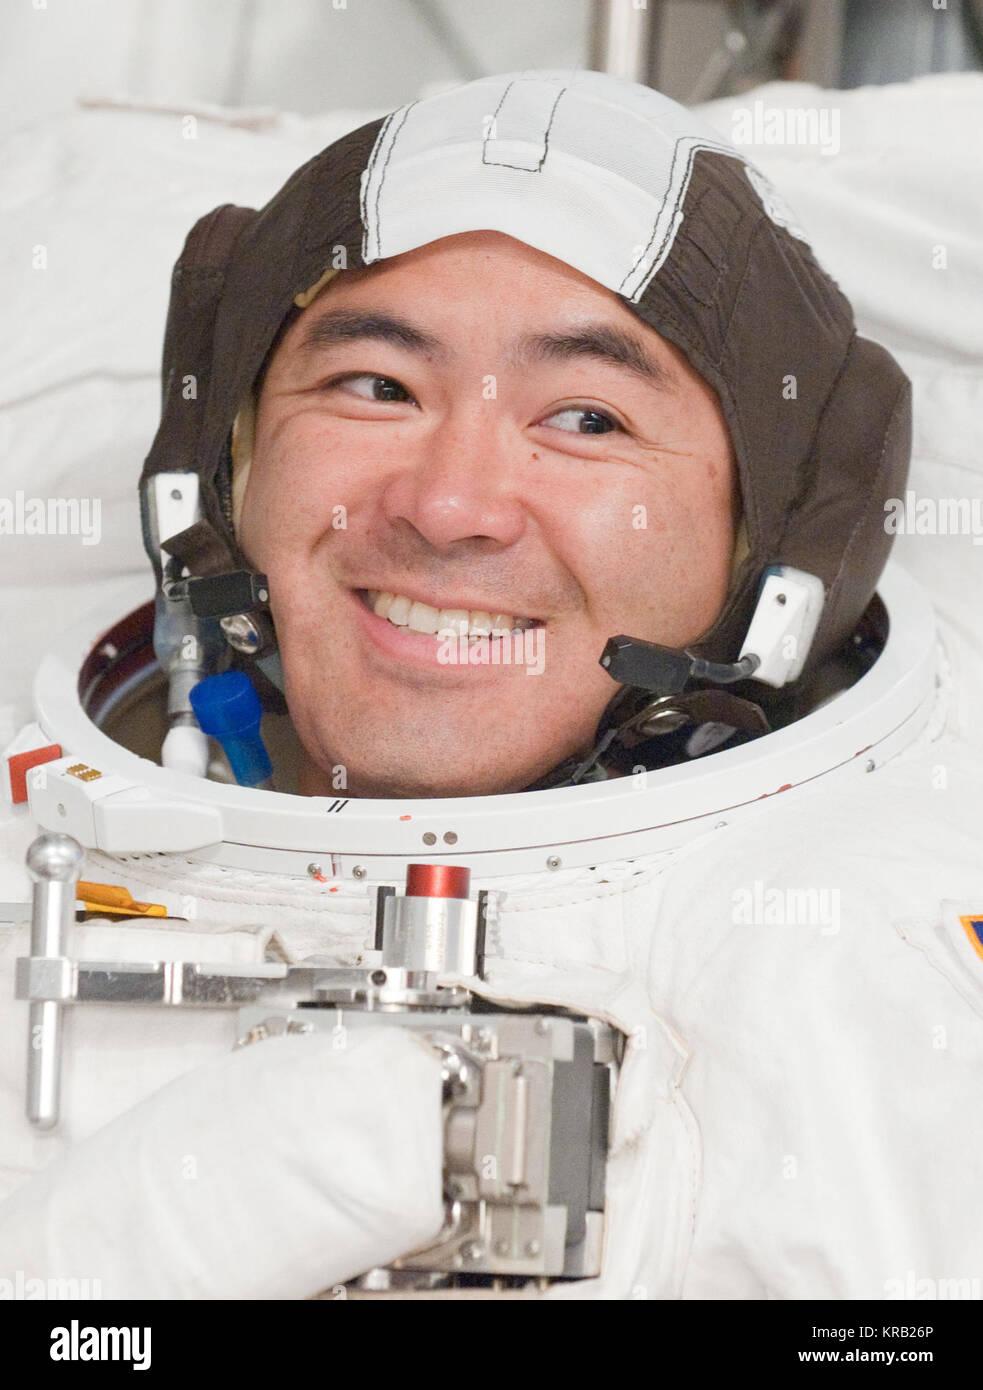 PHOTO DATE: 31 August 2011 LOCATION: Bldg. 7, SSATA Chamber SUBJECT: Expedition 32 crew member and JAXA astronaut, - Stock Image